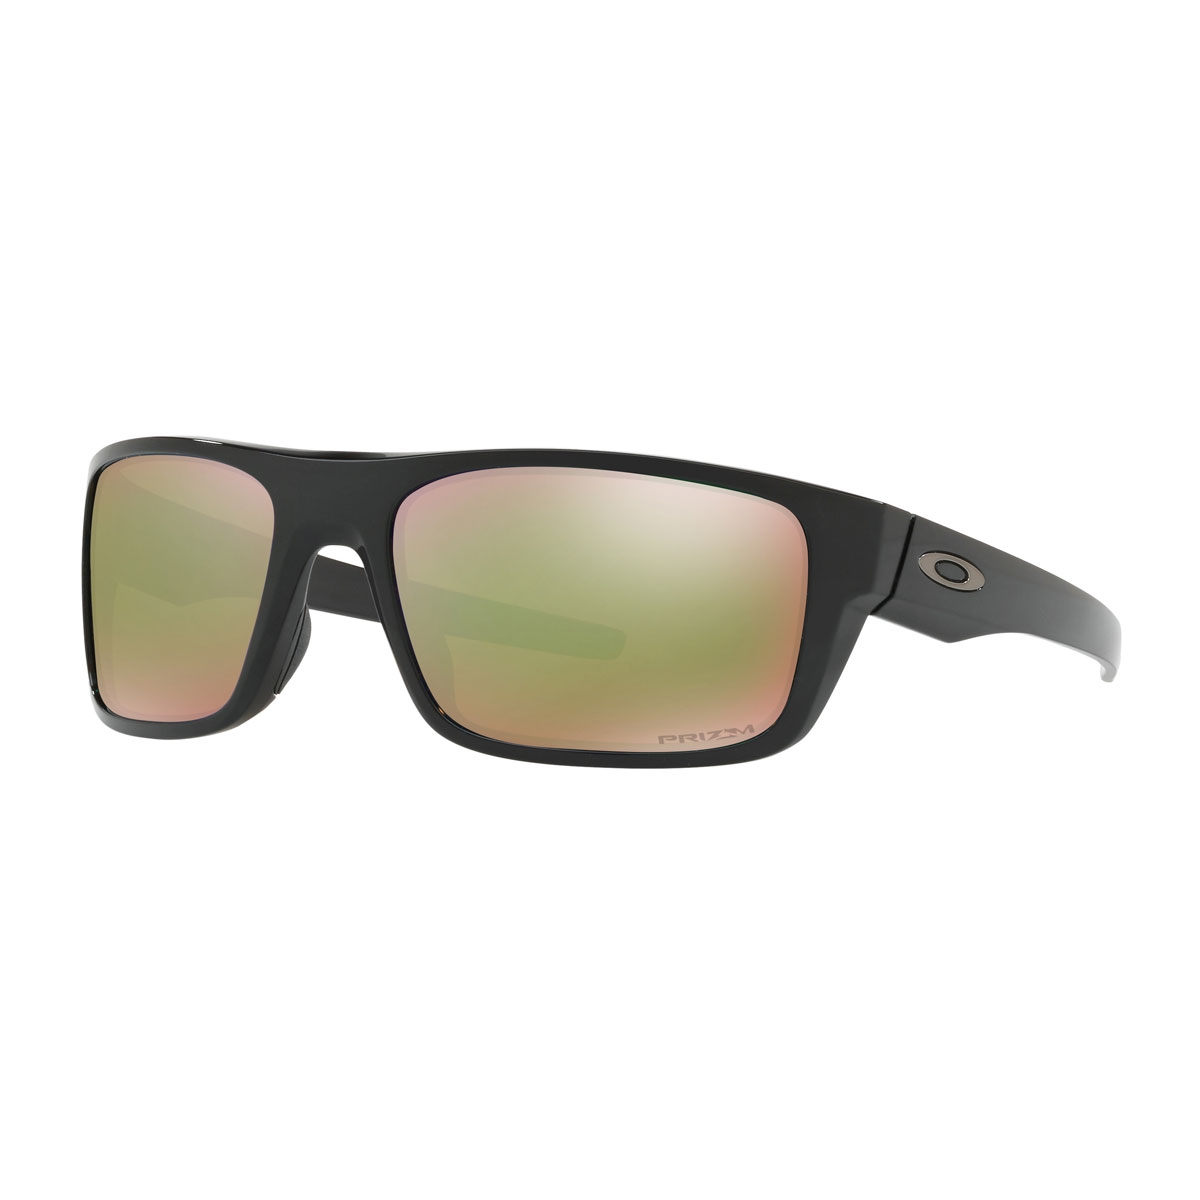 a73767b5c45f Image of Oakley Drop Point Prizm Polarised Sunglasses - Polished Black  Frame PRIZM Shallow Water